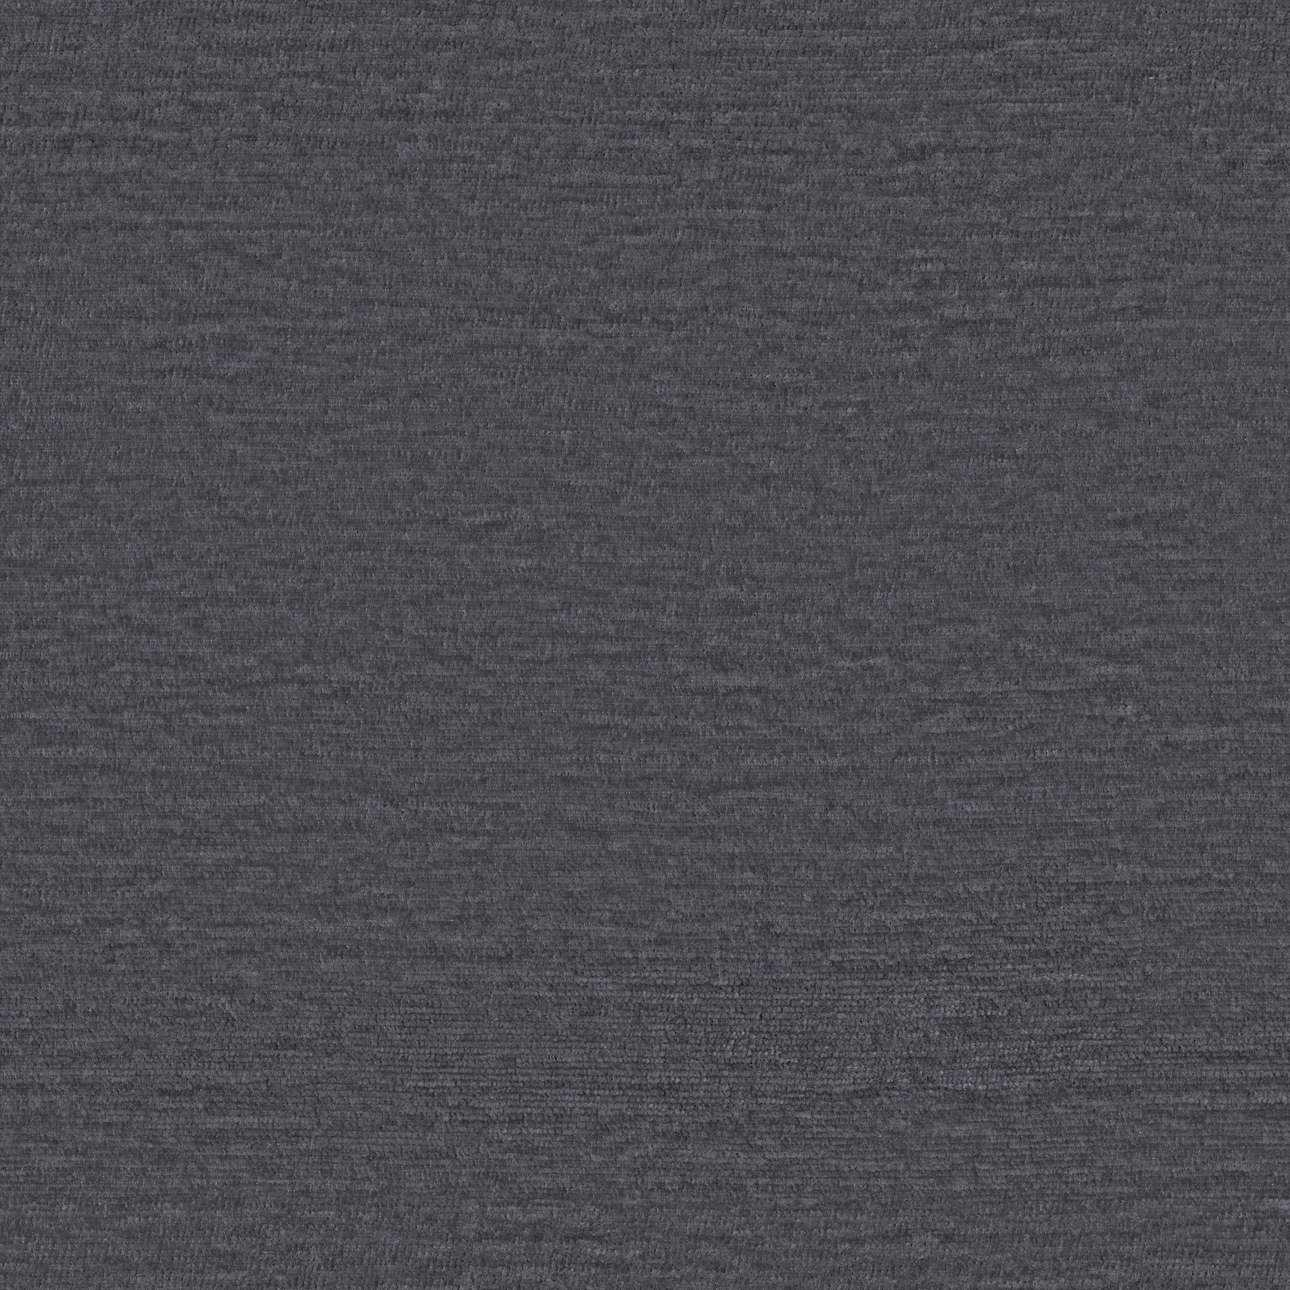 Chenille 702-20 w kolekcji Chenille, tkanina: 702-20